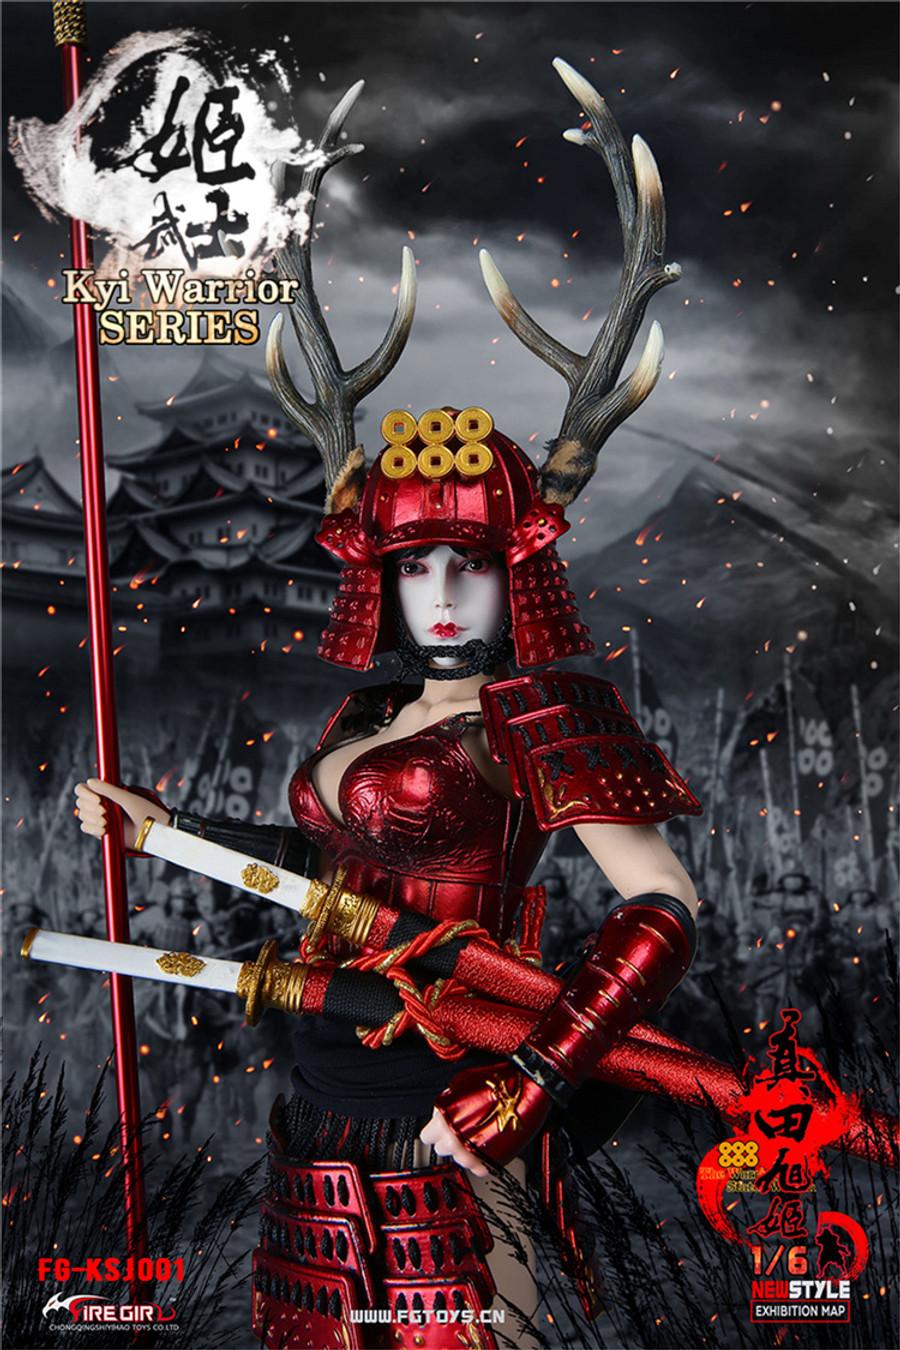 Fire Girl Toys - Warring States of Japanese Women: Warrior Suit Sanada Xu Kyi - Red